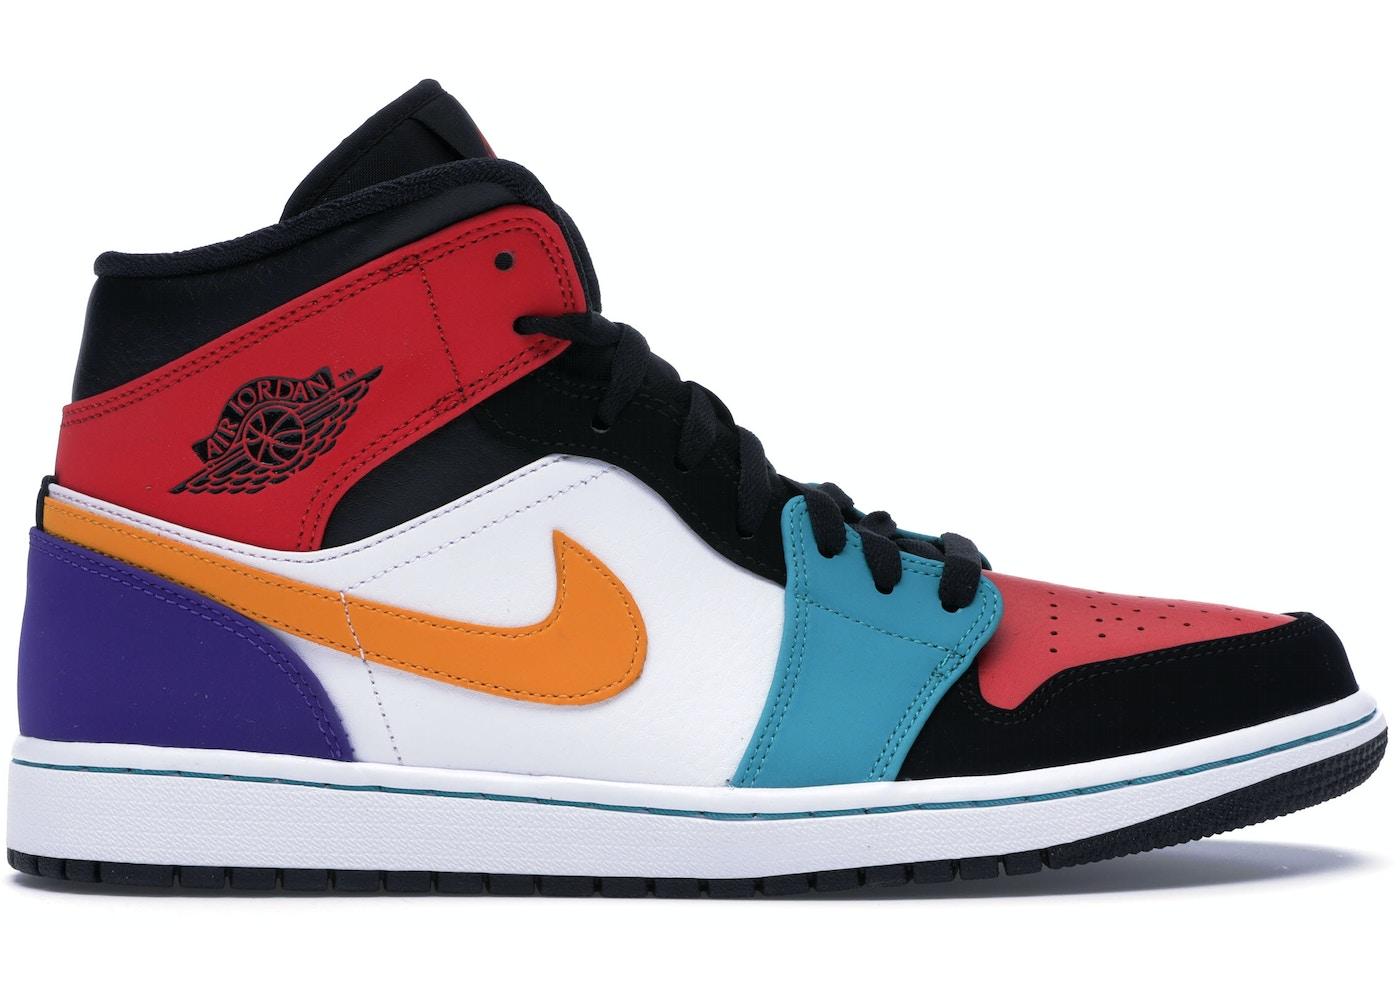 buty na tanie przemyślenia na temat lepszy Jordan 1 Mid Bred Multi-Color